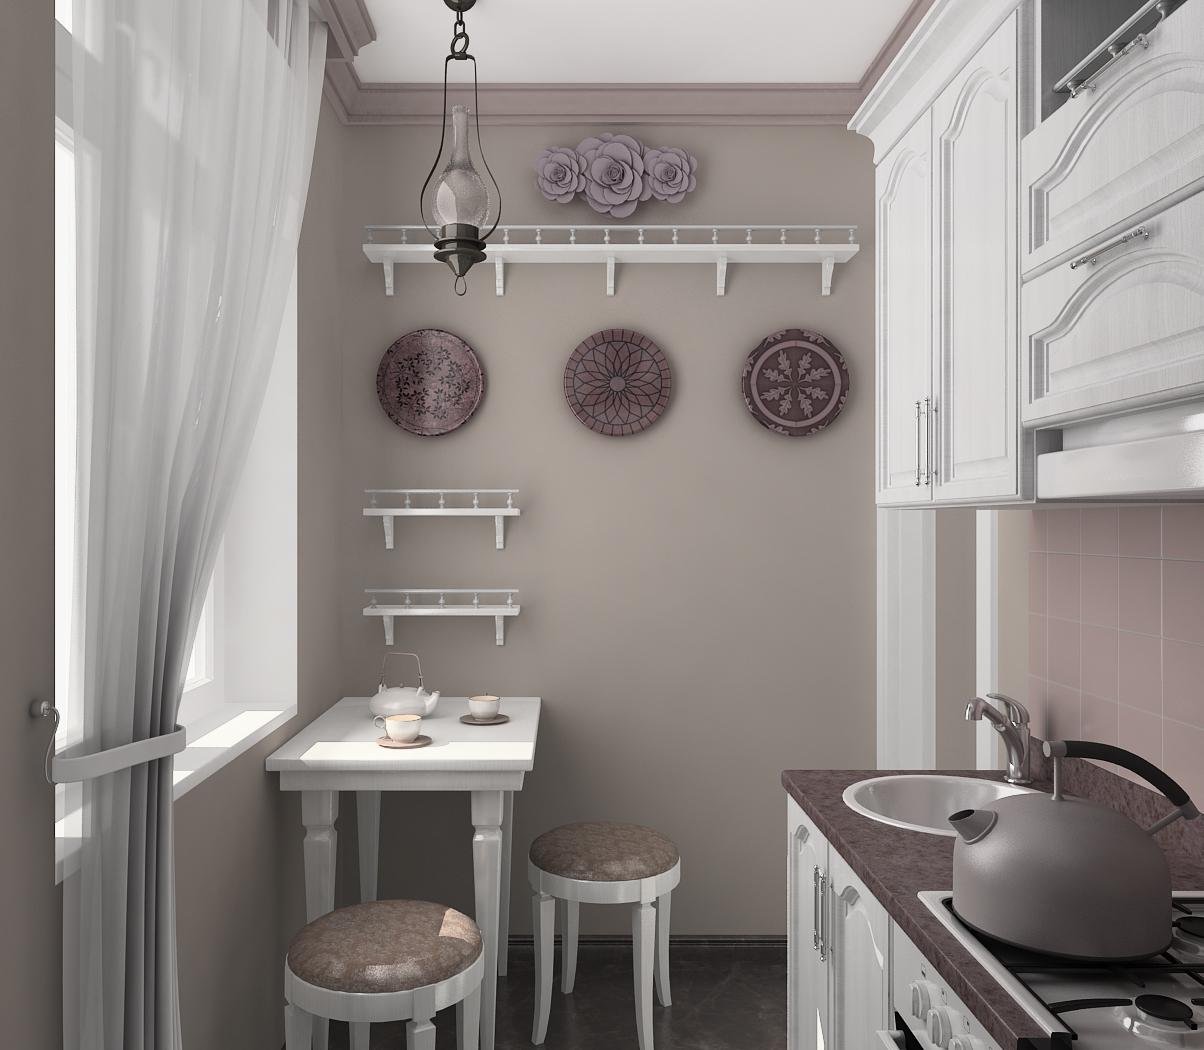 Кухня в хрущевке в стиле прованс